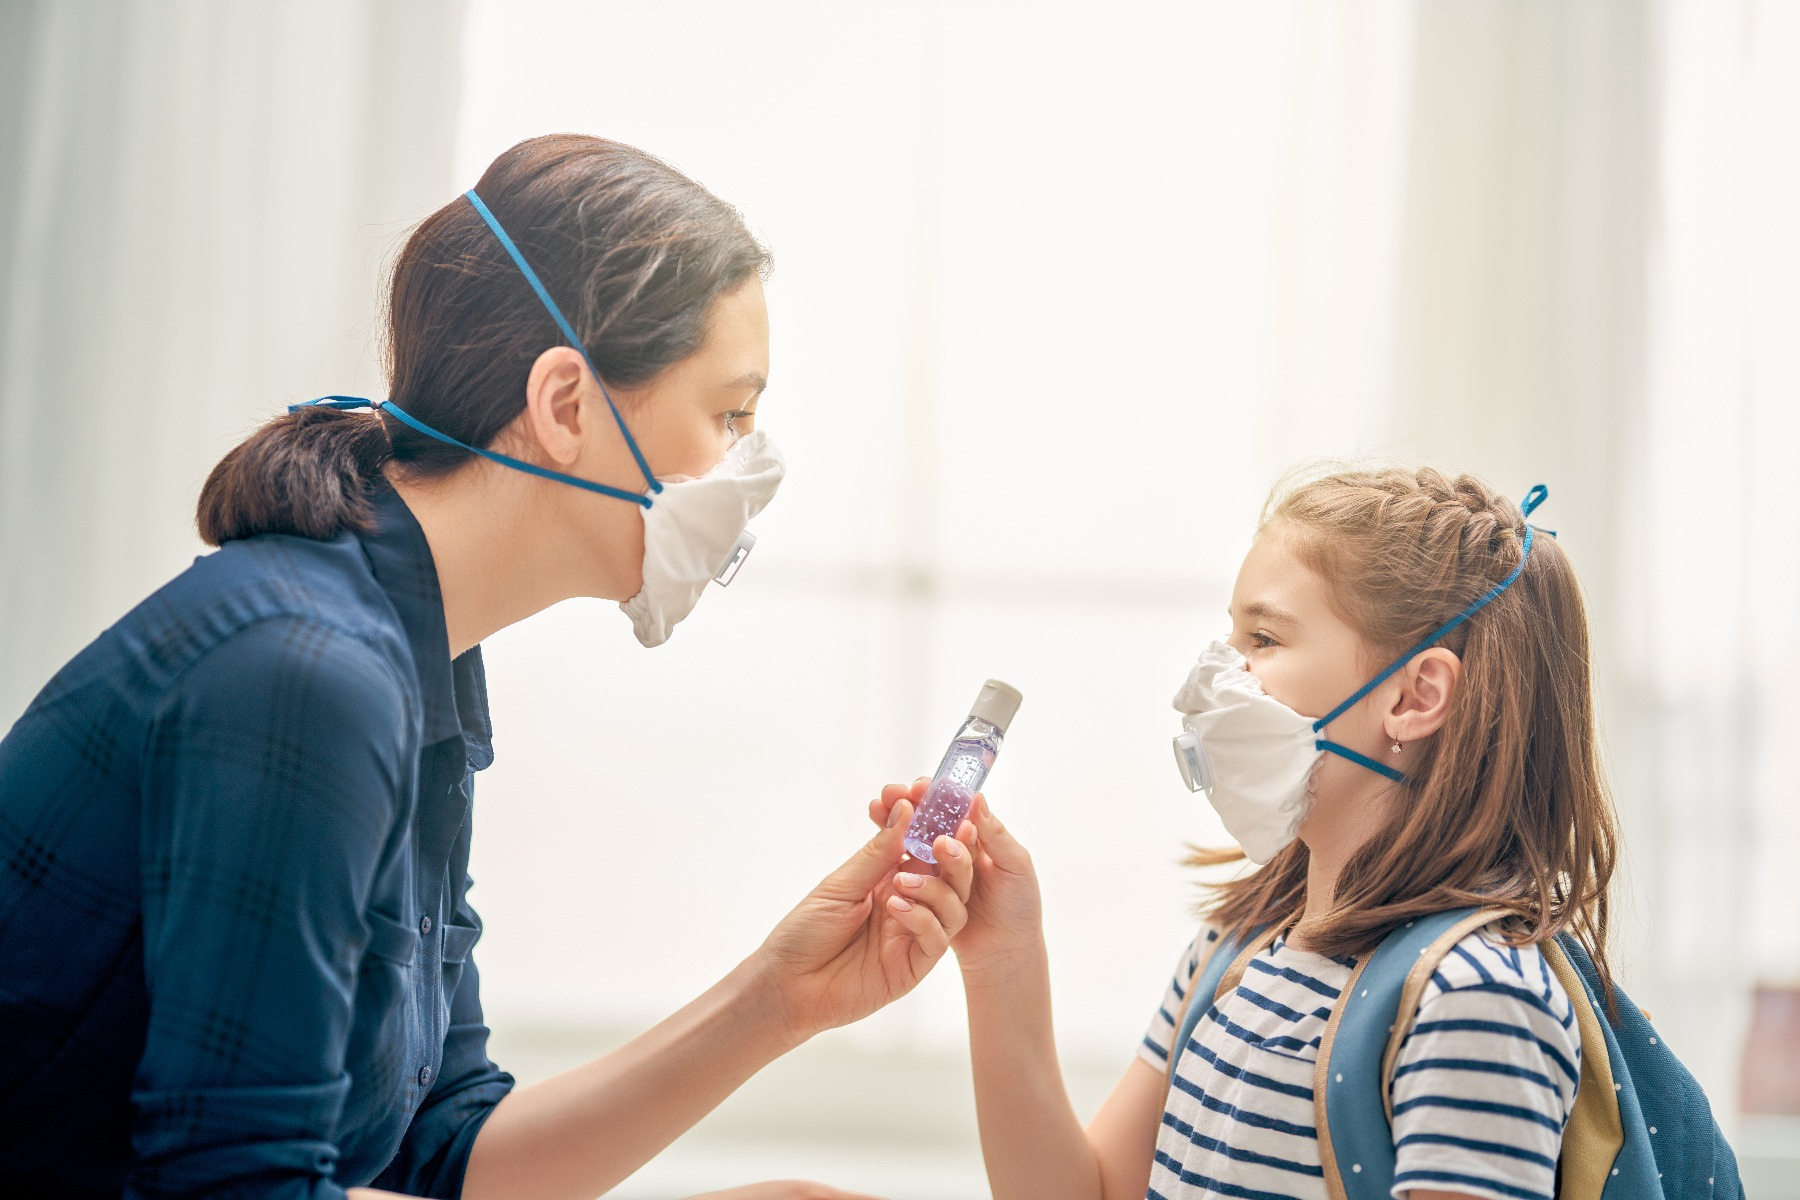 Parent giving child hand sanitizer